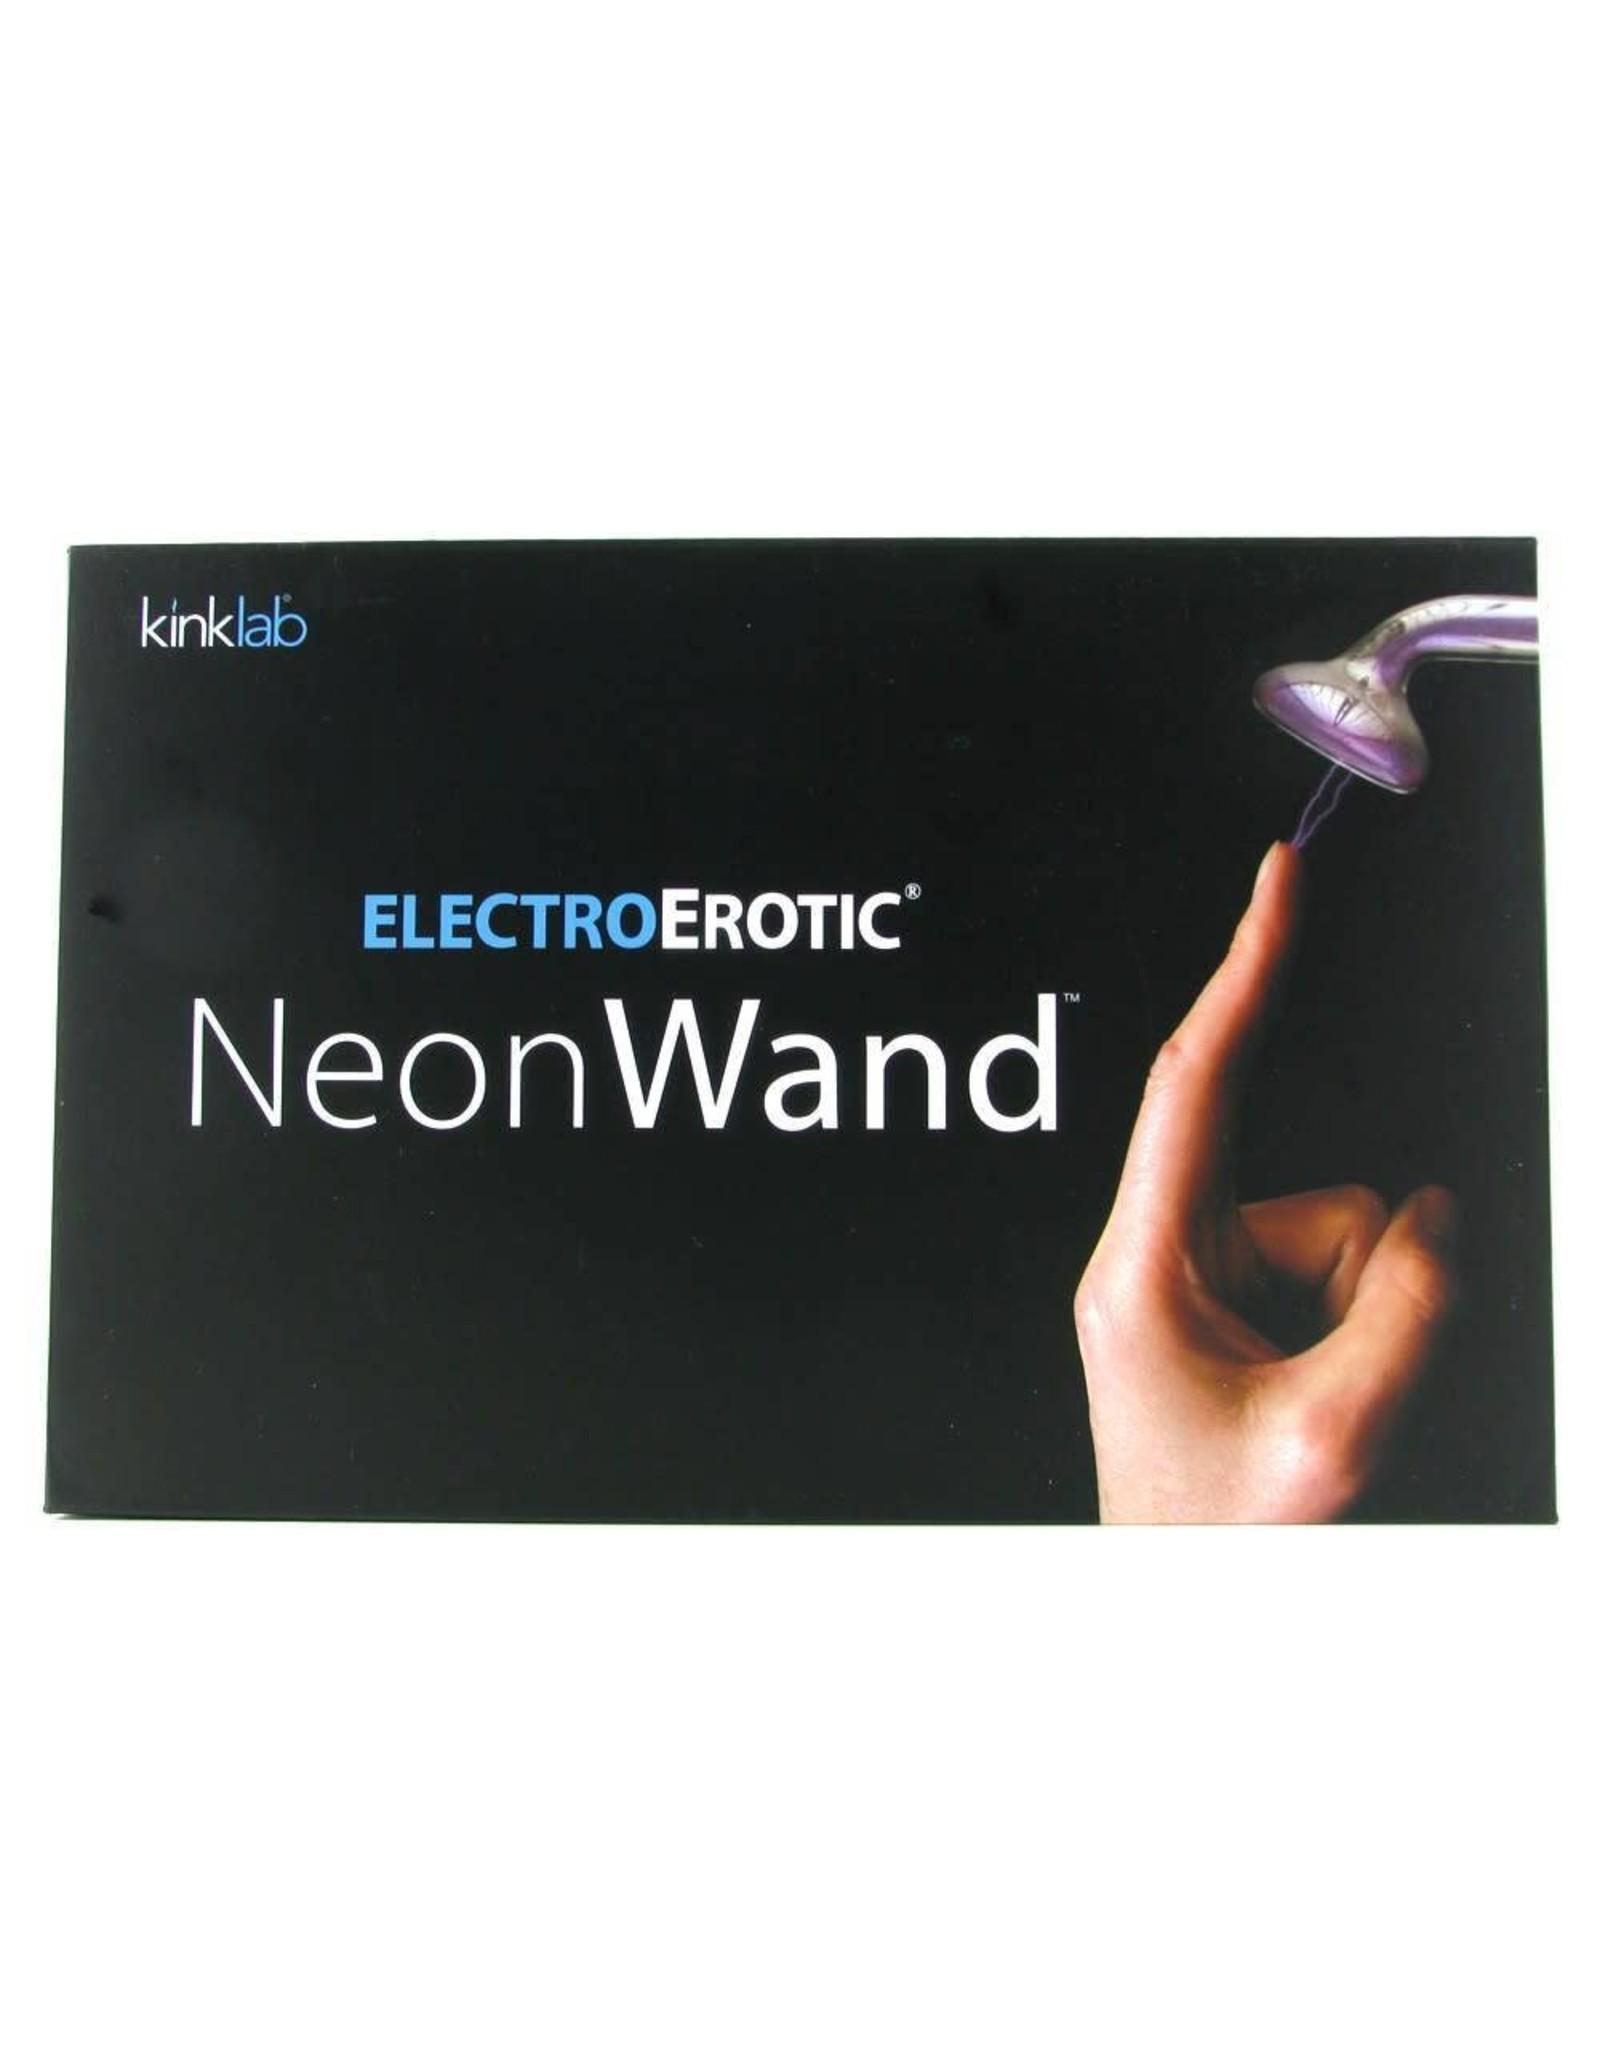 KINKLAB - ELECTRO-EROTIC NEON WAND - RED